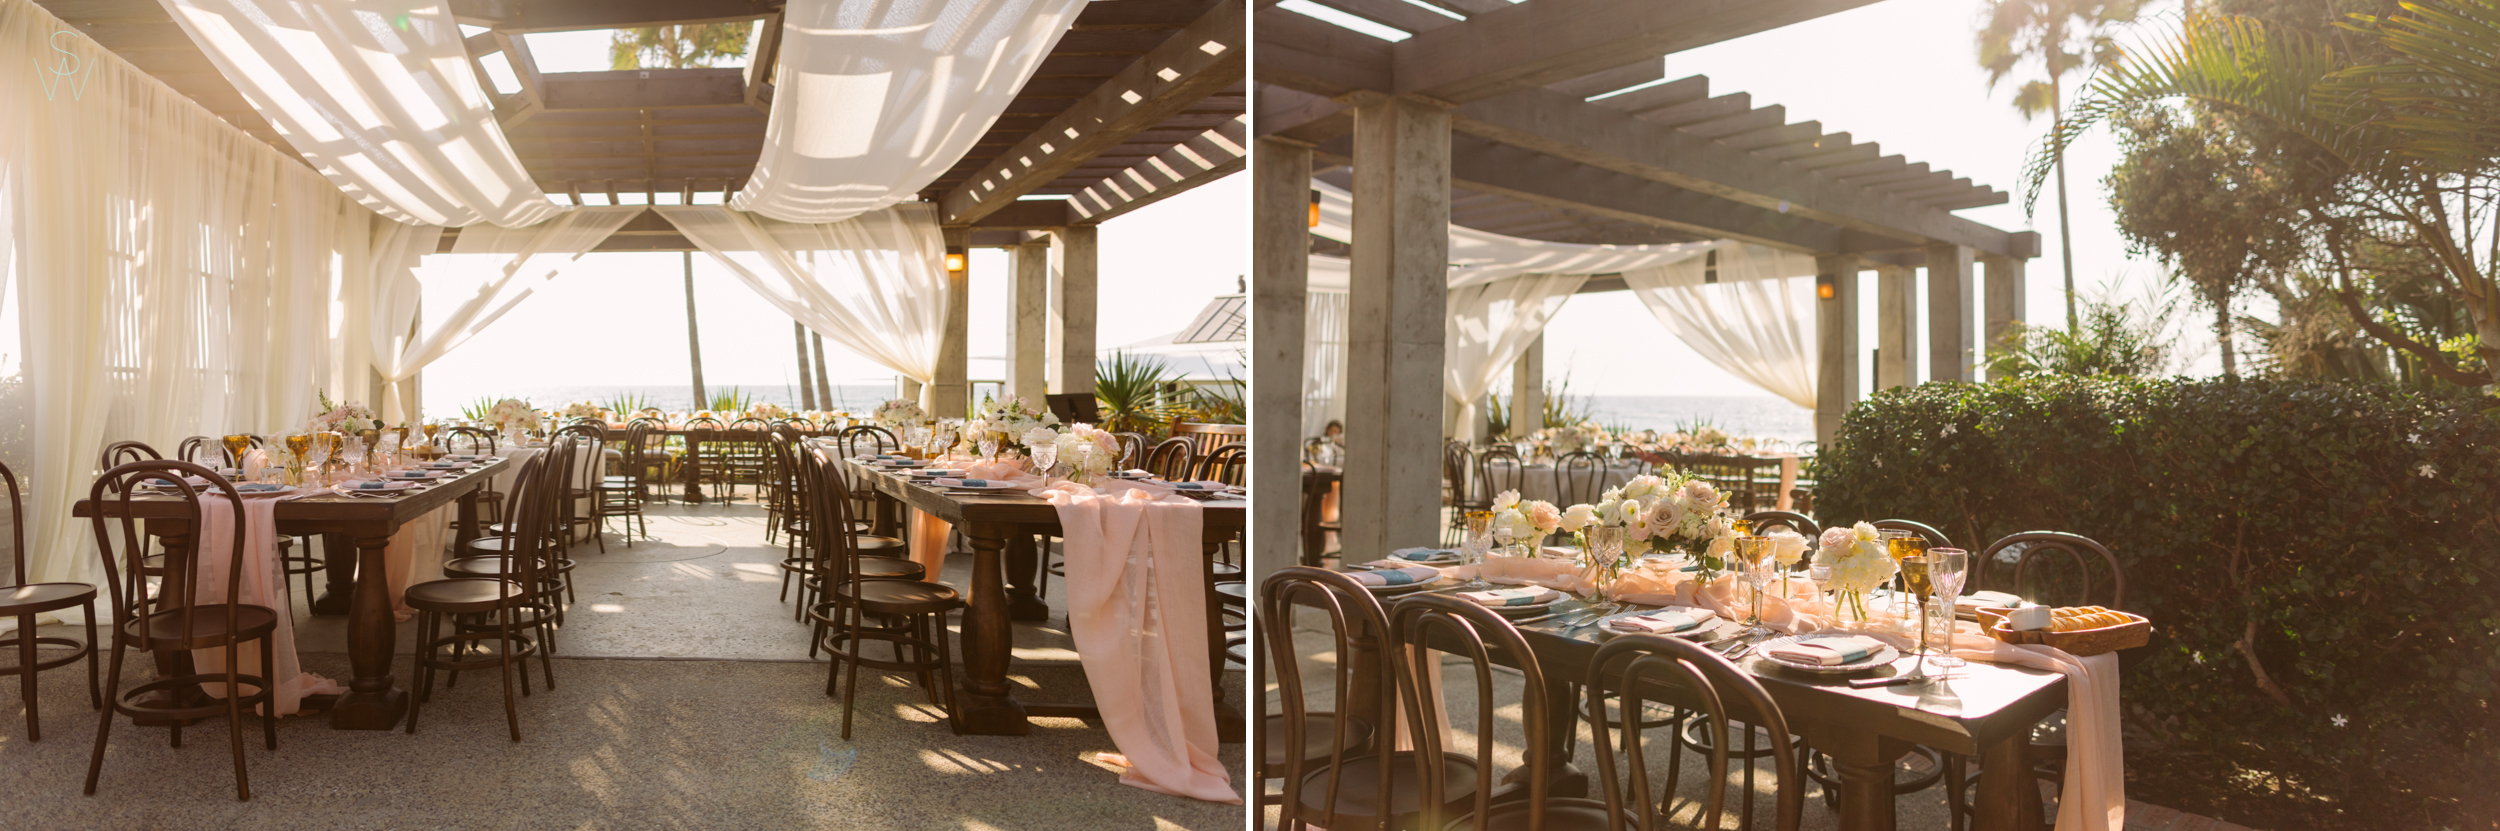 139DEL.MAR.WEDDINGS.luxeeventsphotography.shewanders.JPG